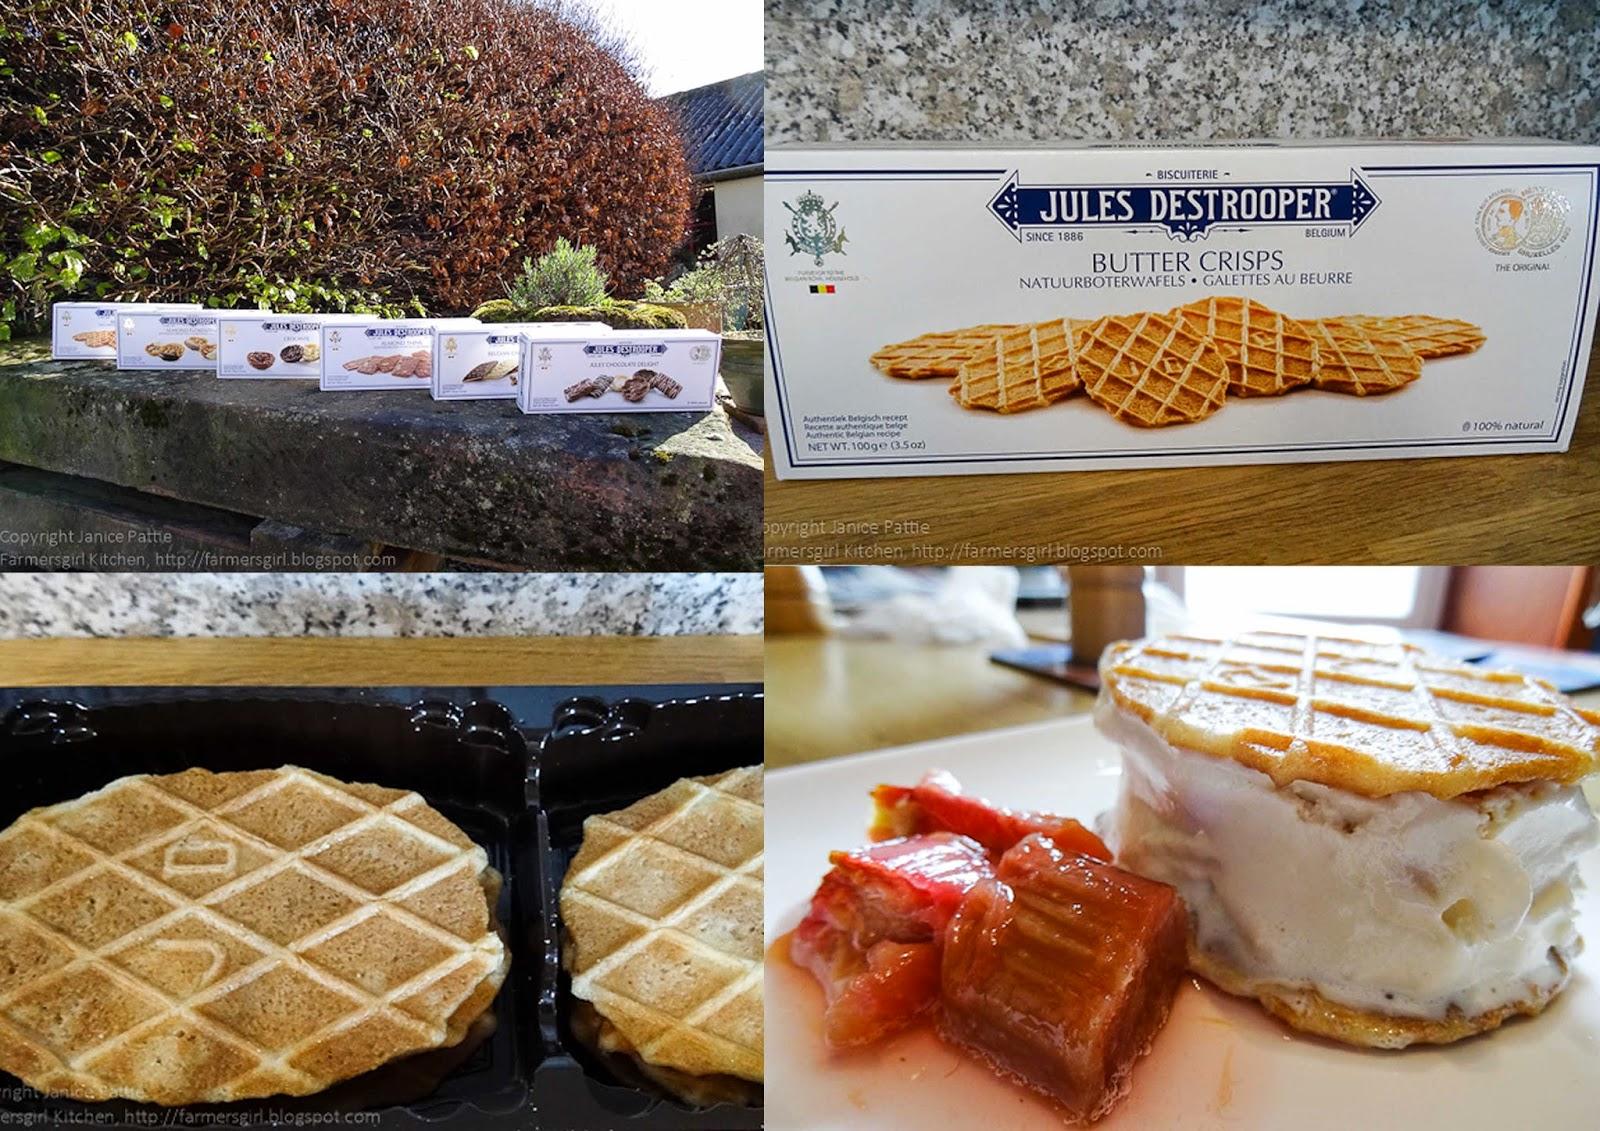 Ginger Crisp Ice Cream Sandwiches Recipes — Dishmaps